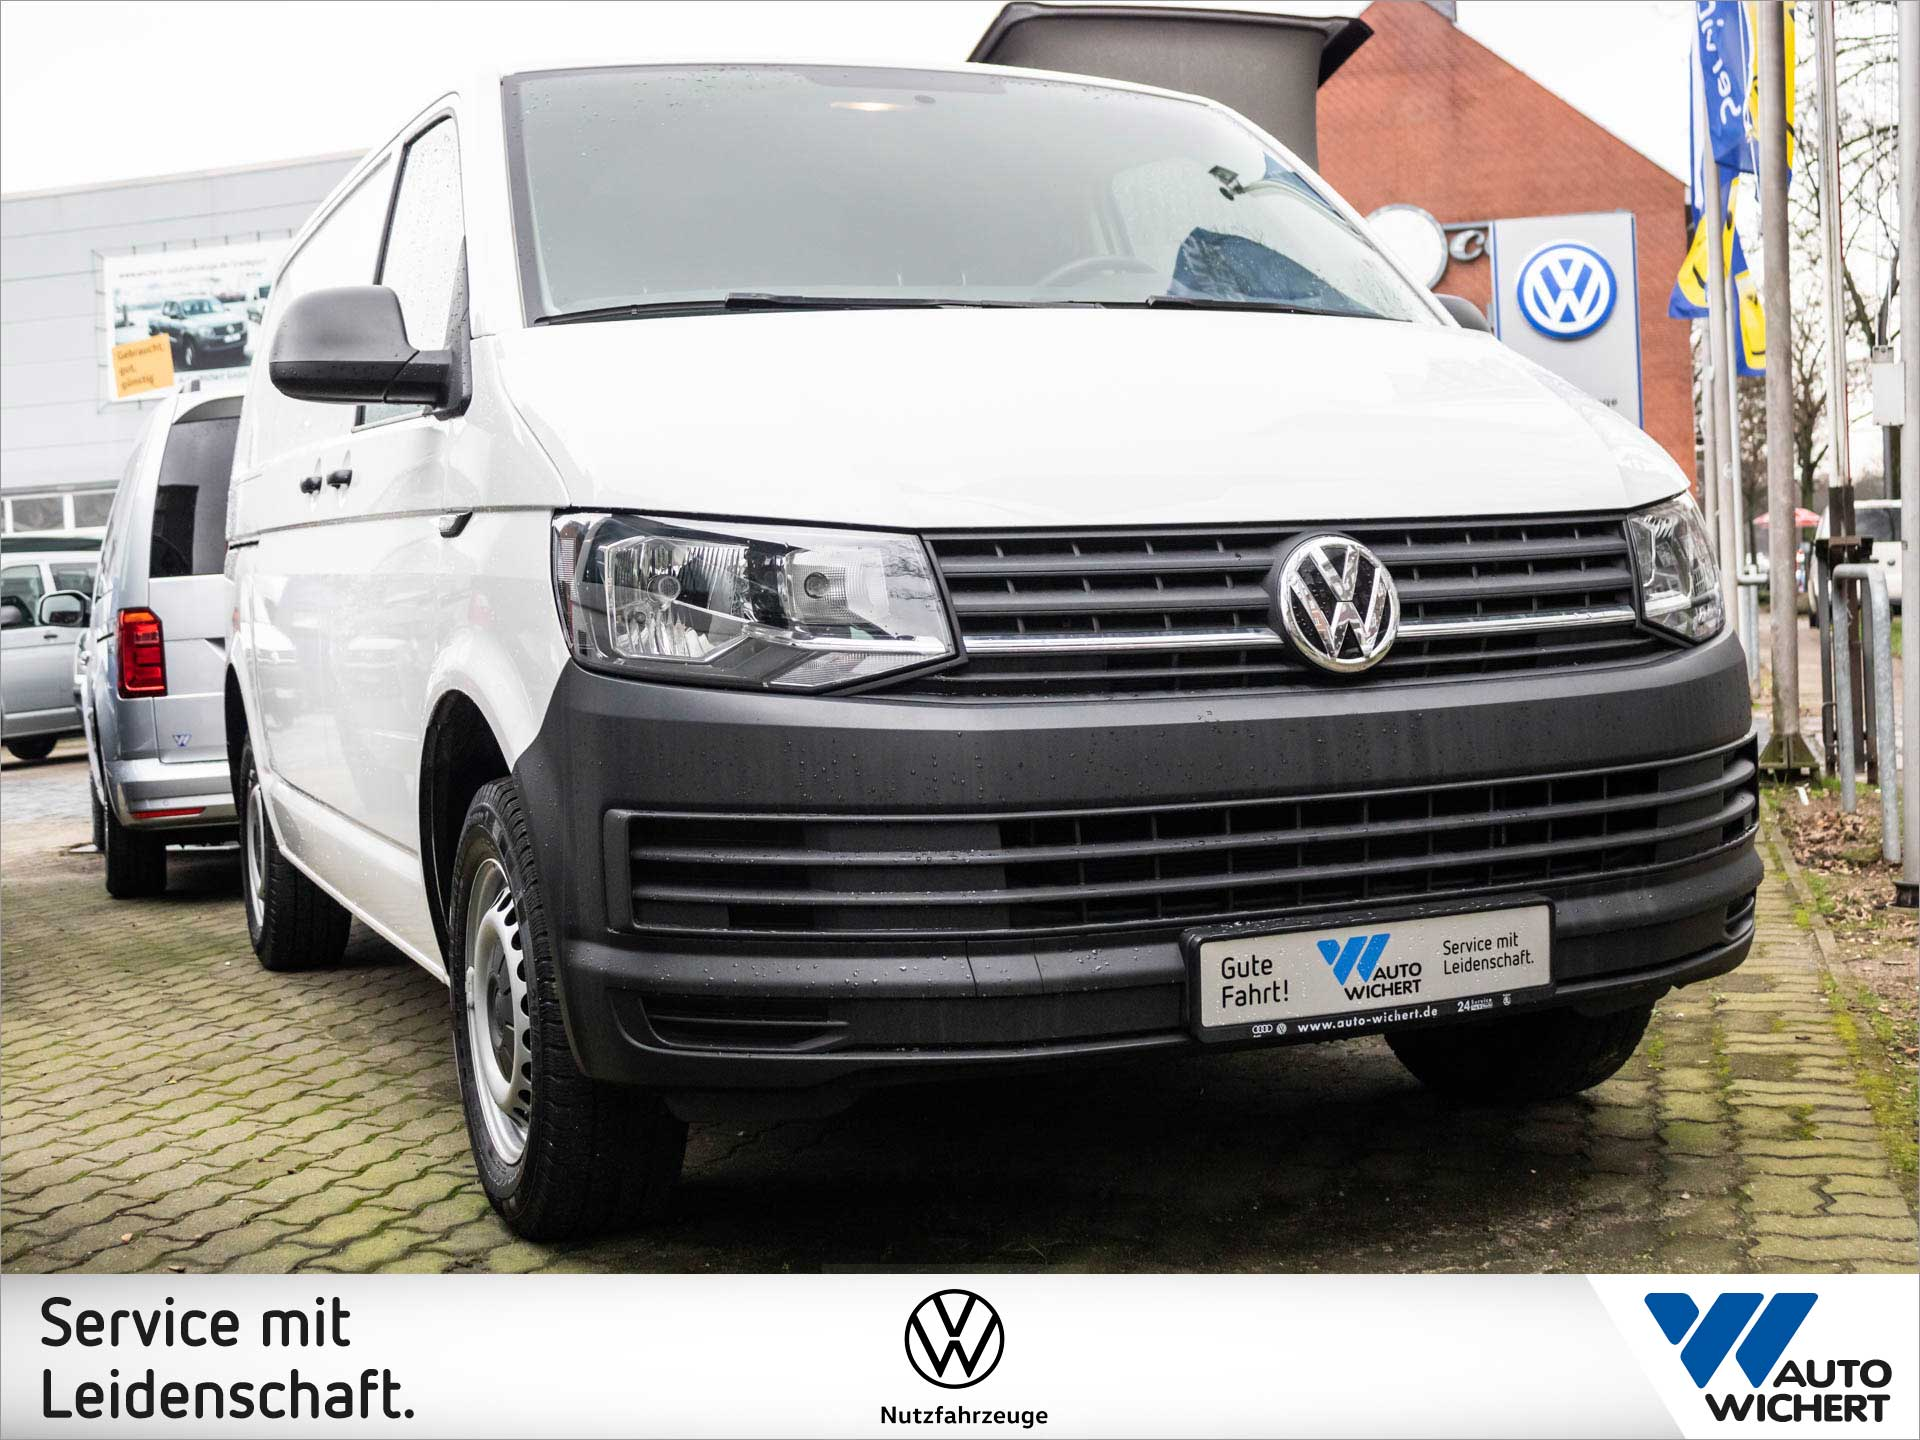 Volkswagen T6 Transporter Kasten 2.0 TDI 5-Gang AHK, Jahr 2016, Diesel